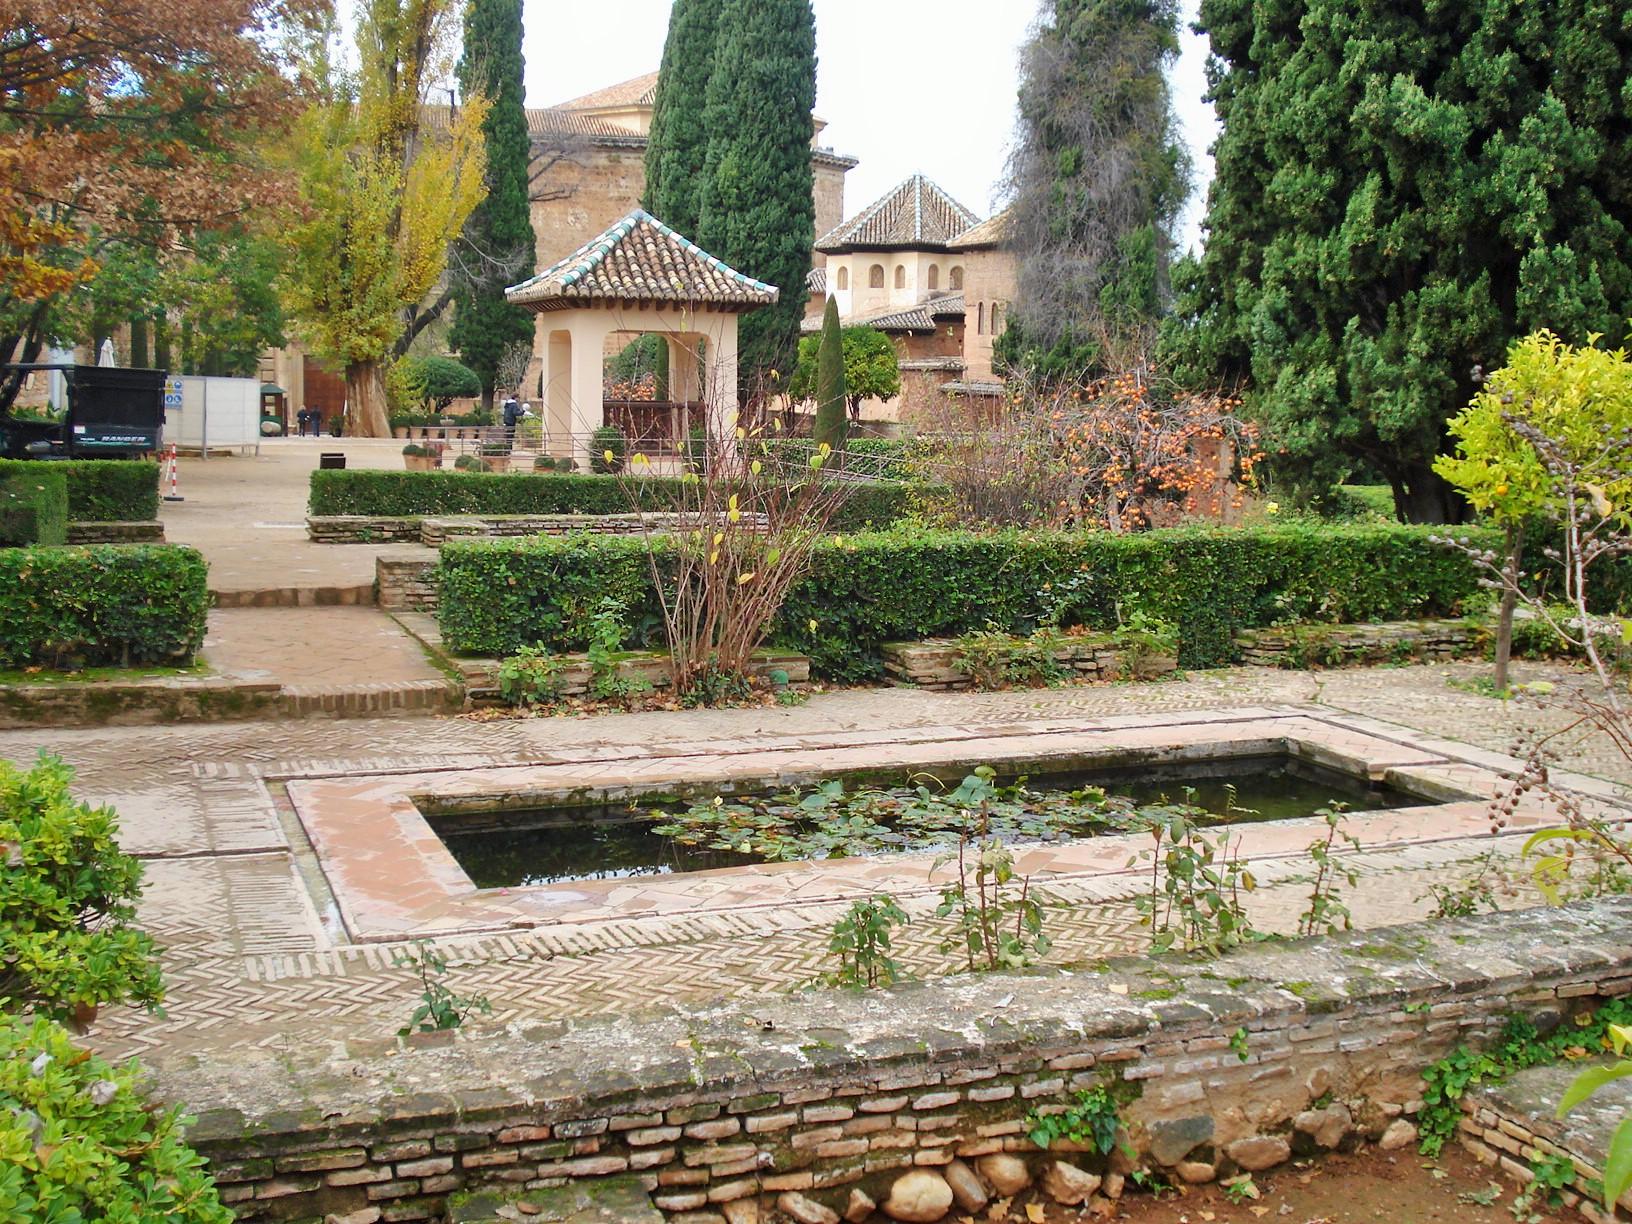 The Alhambra's Gardens in Granada: The UpperTerraces